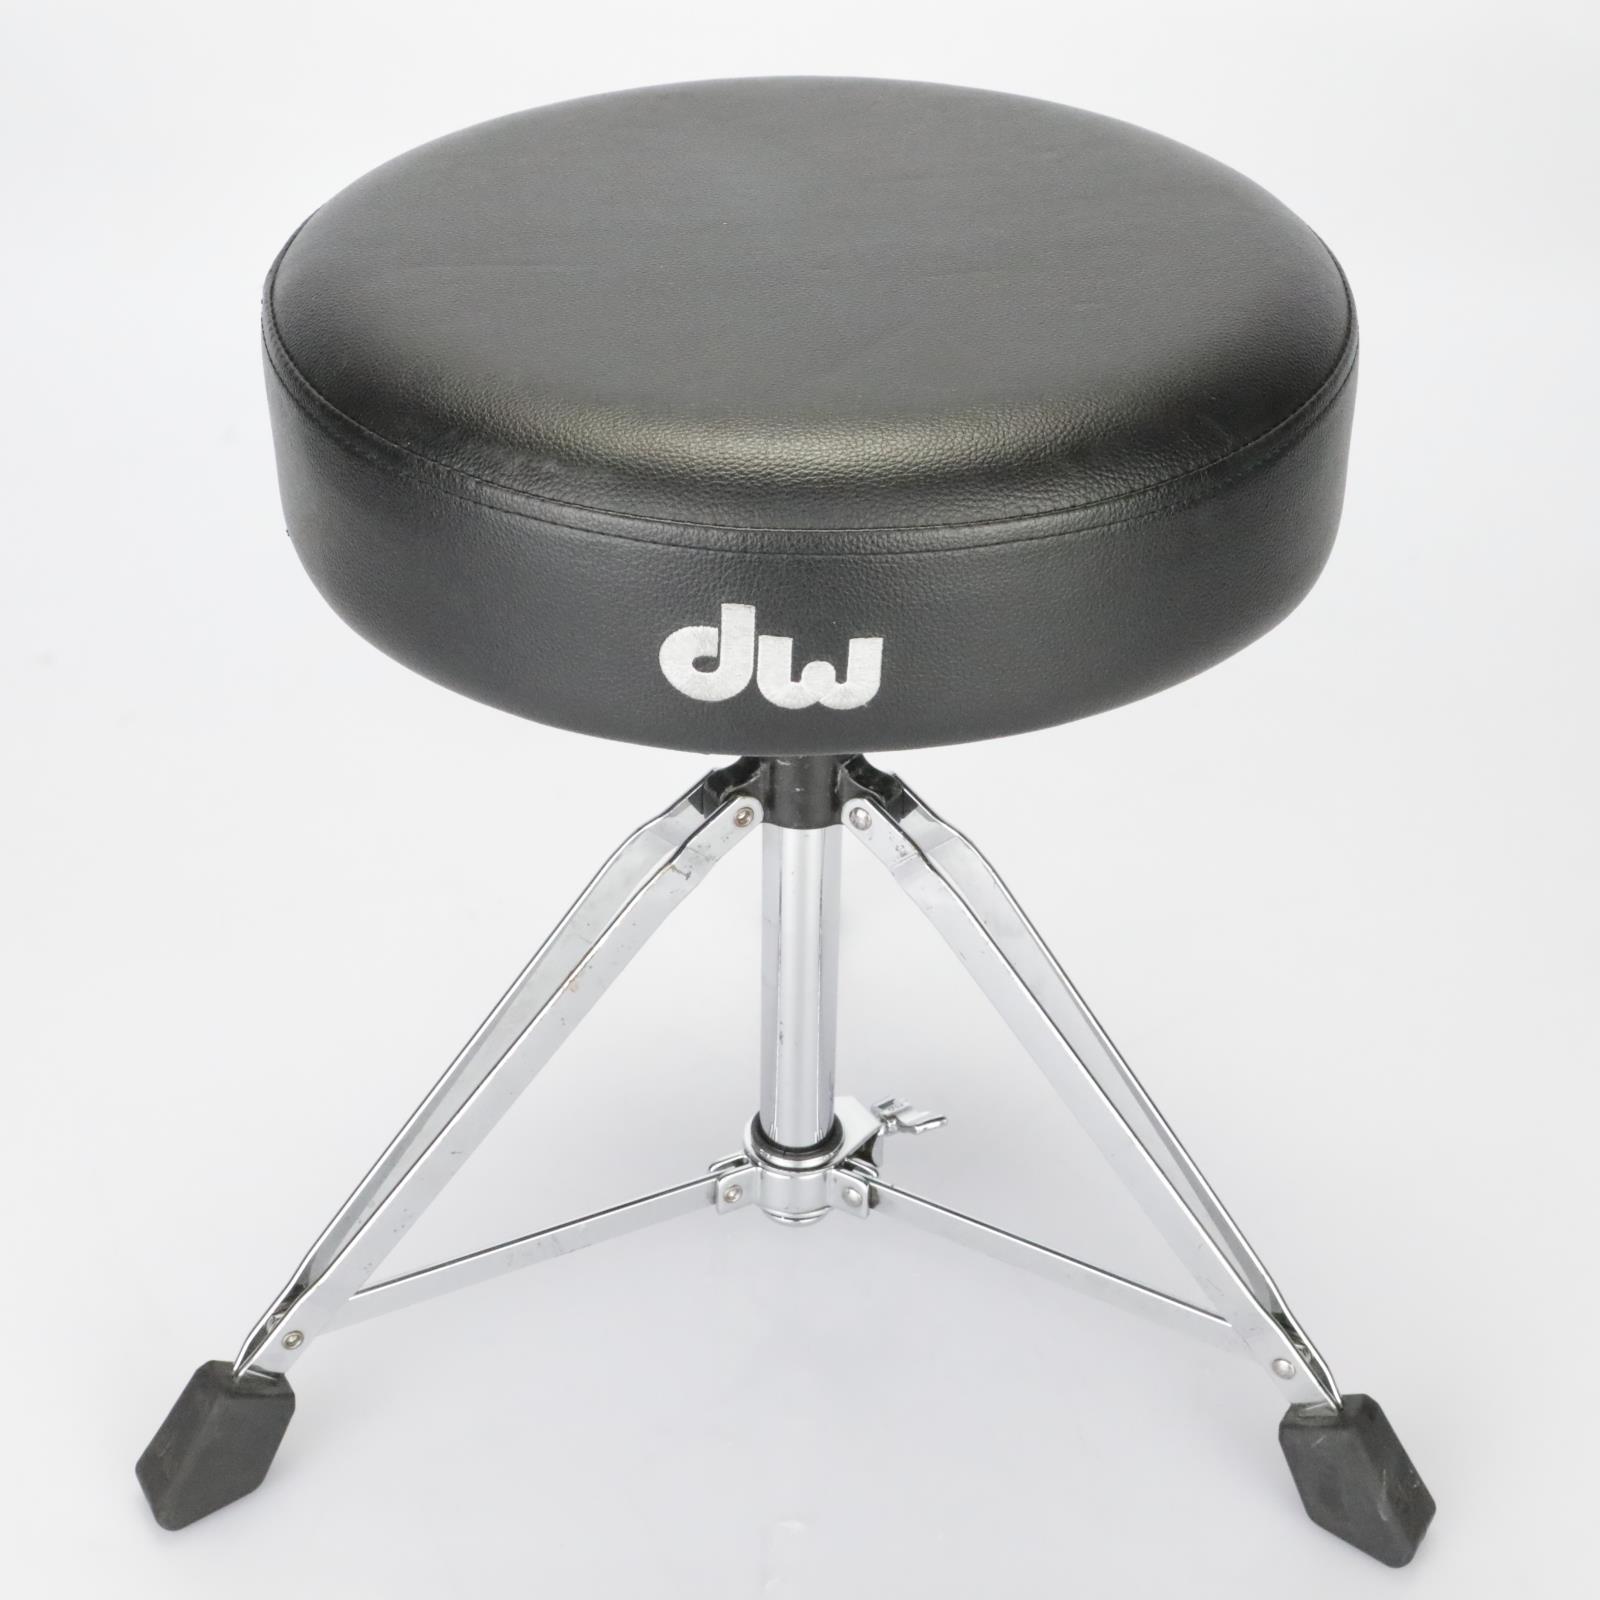 Drum Workshop DW 9100M Double-Braced Throne Seat Stool Boys Like Girls #39424